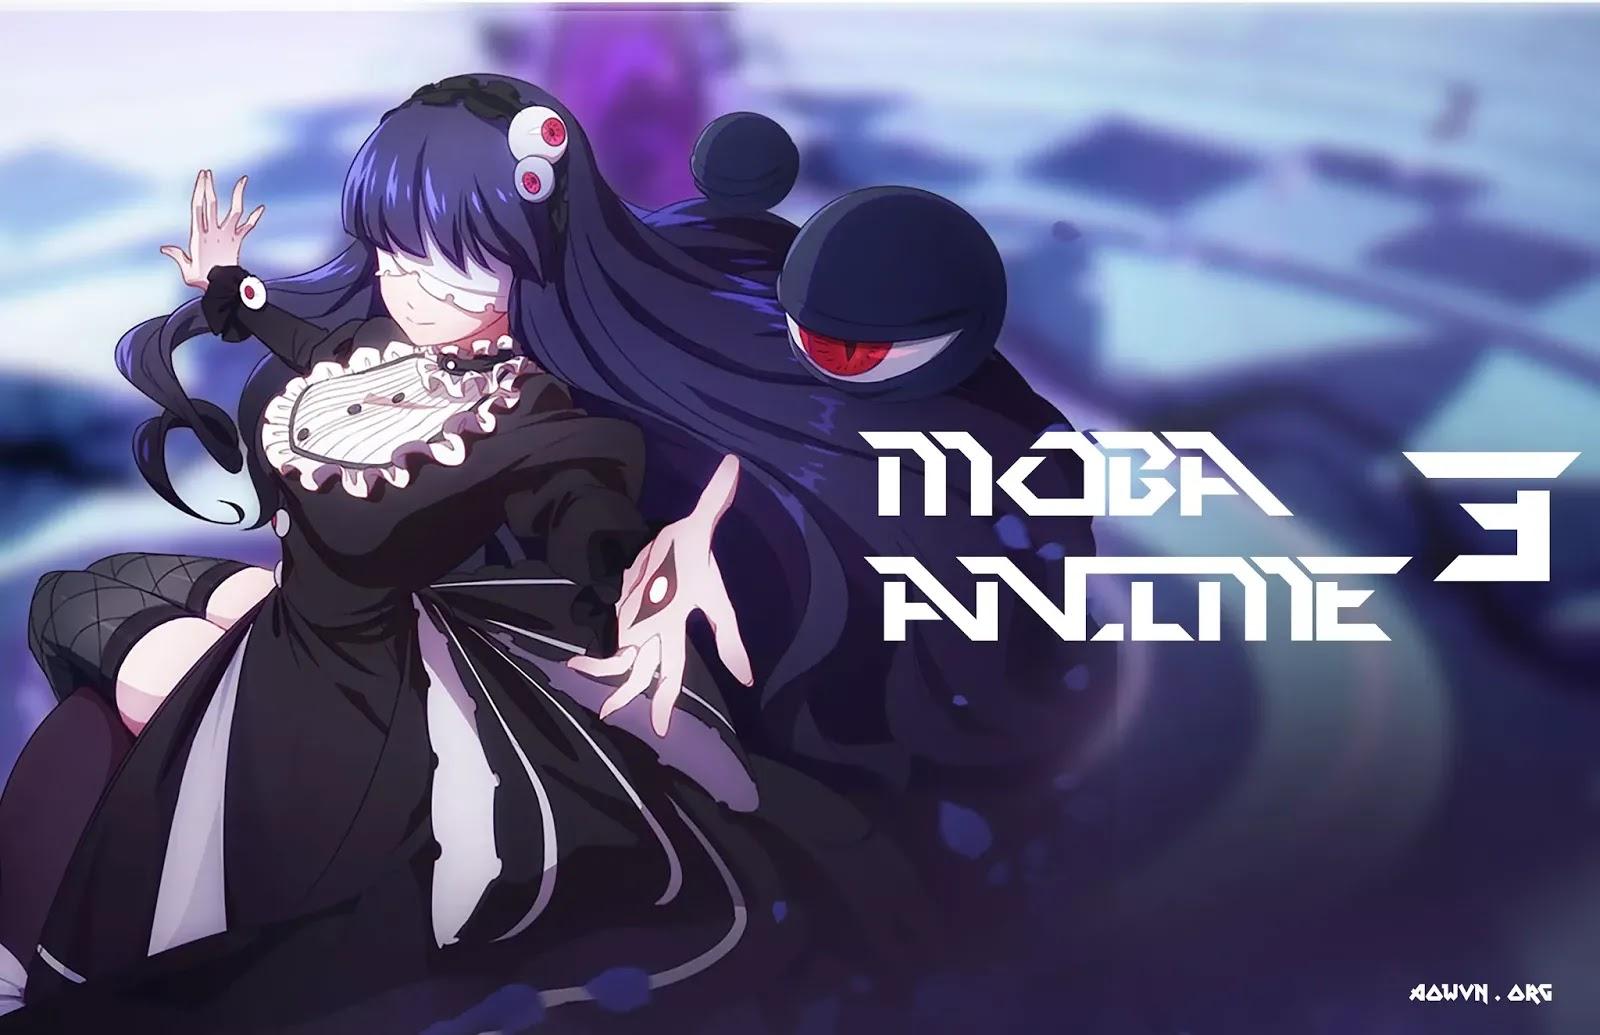 AowVN.org minz%2B%252825%2529 - [ HOT ] Moba Anime 3 - Non-human Academy | Game Android & IOS - Siêu phẩm tuyệt hay 60FPS không lag